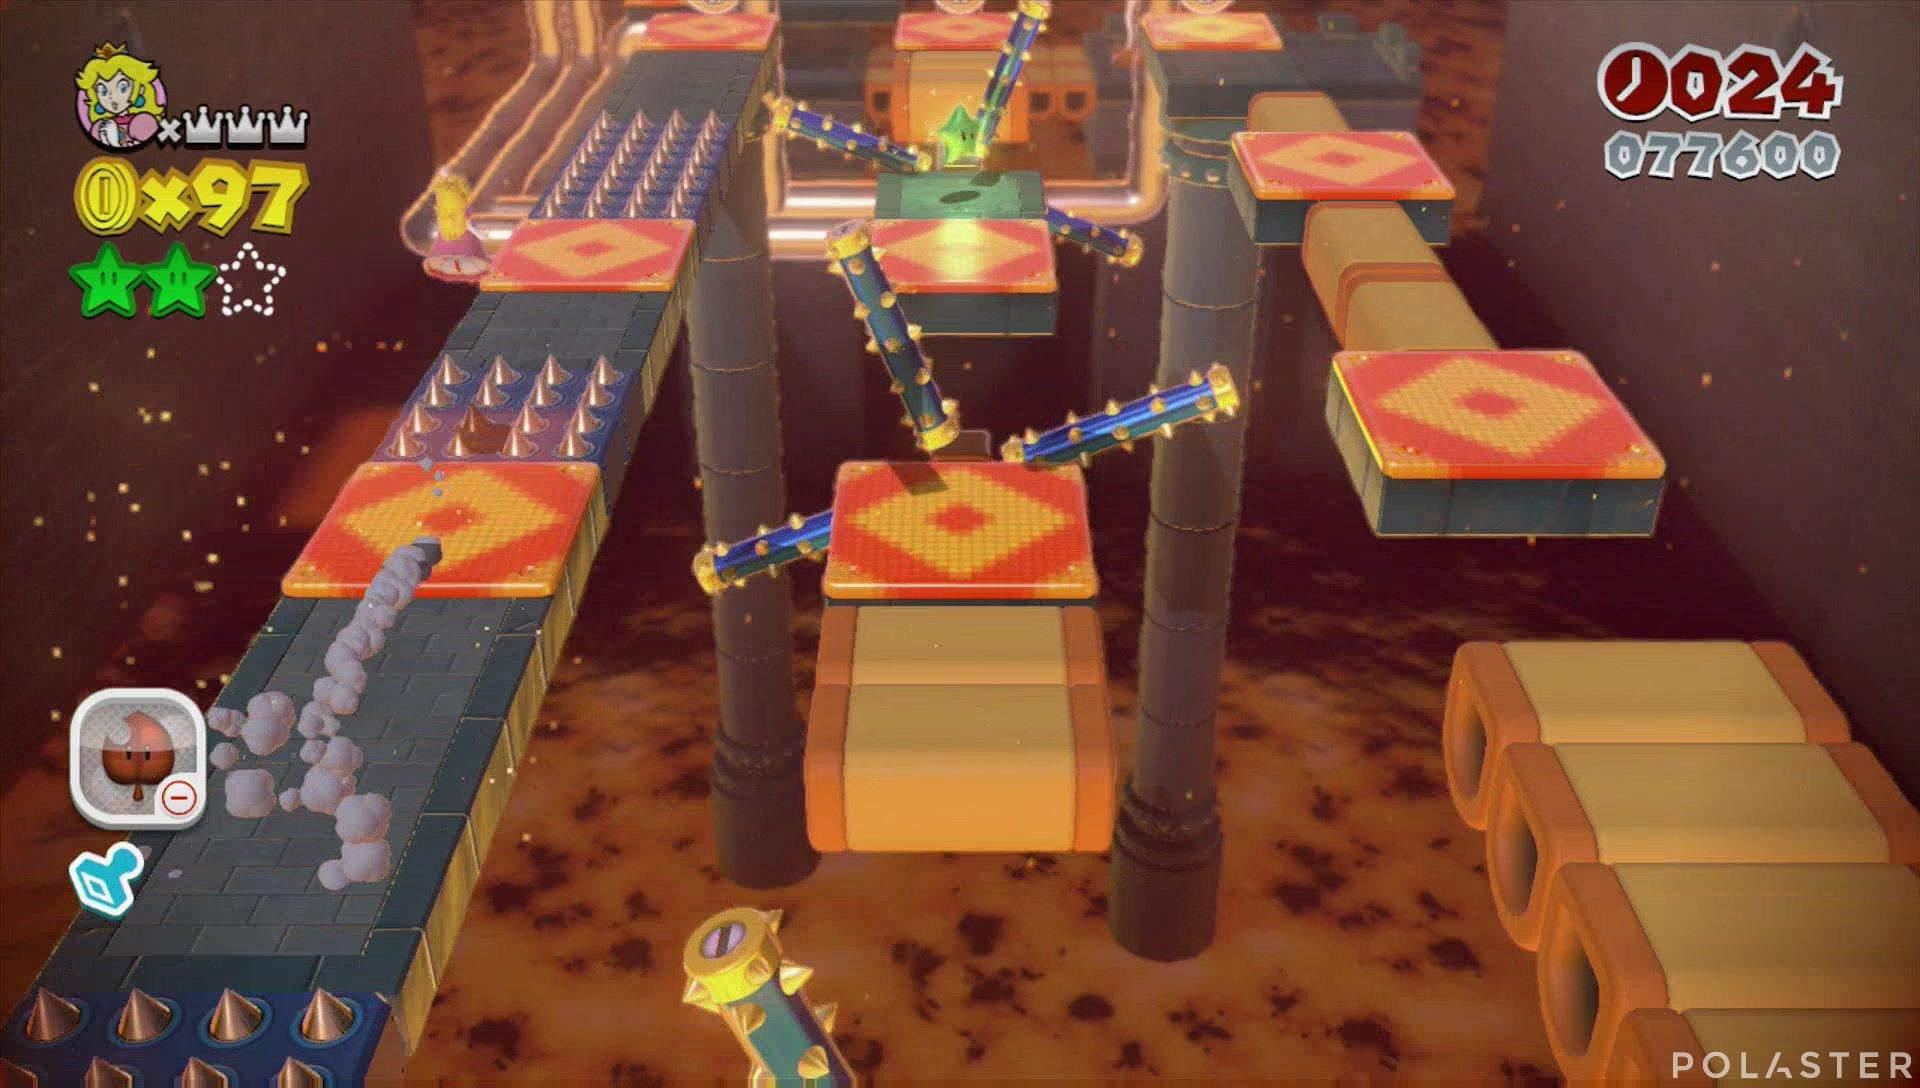 Super Mario 3D World Mundo Castillo-3 Estrella 3